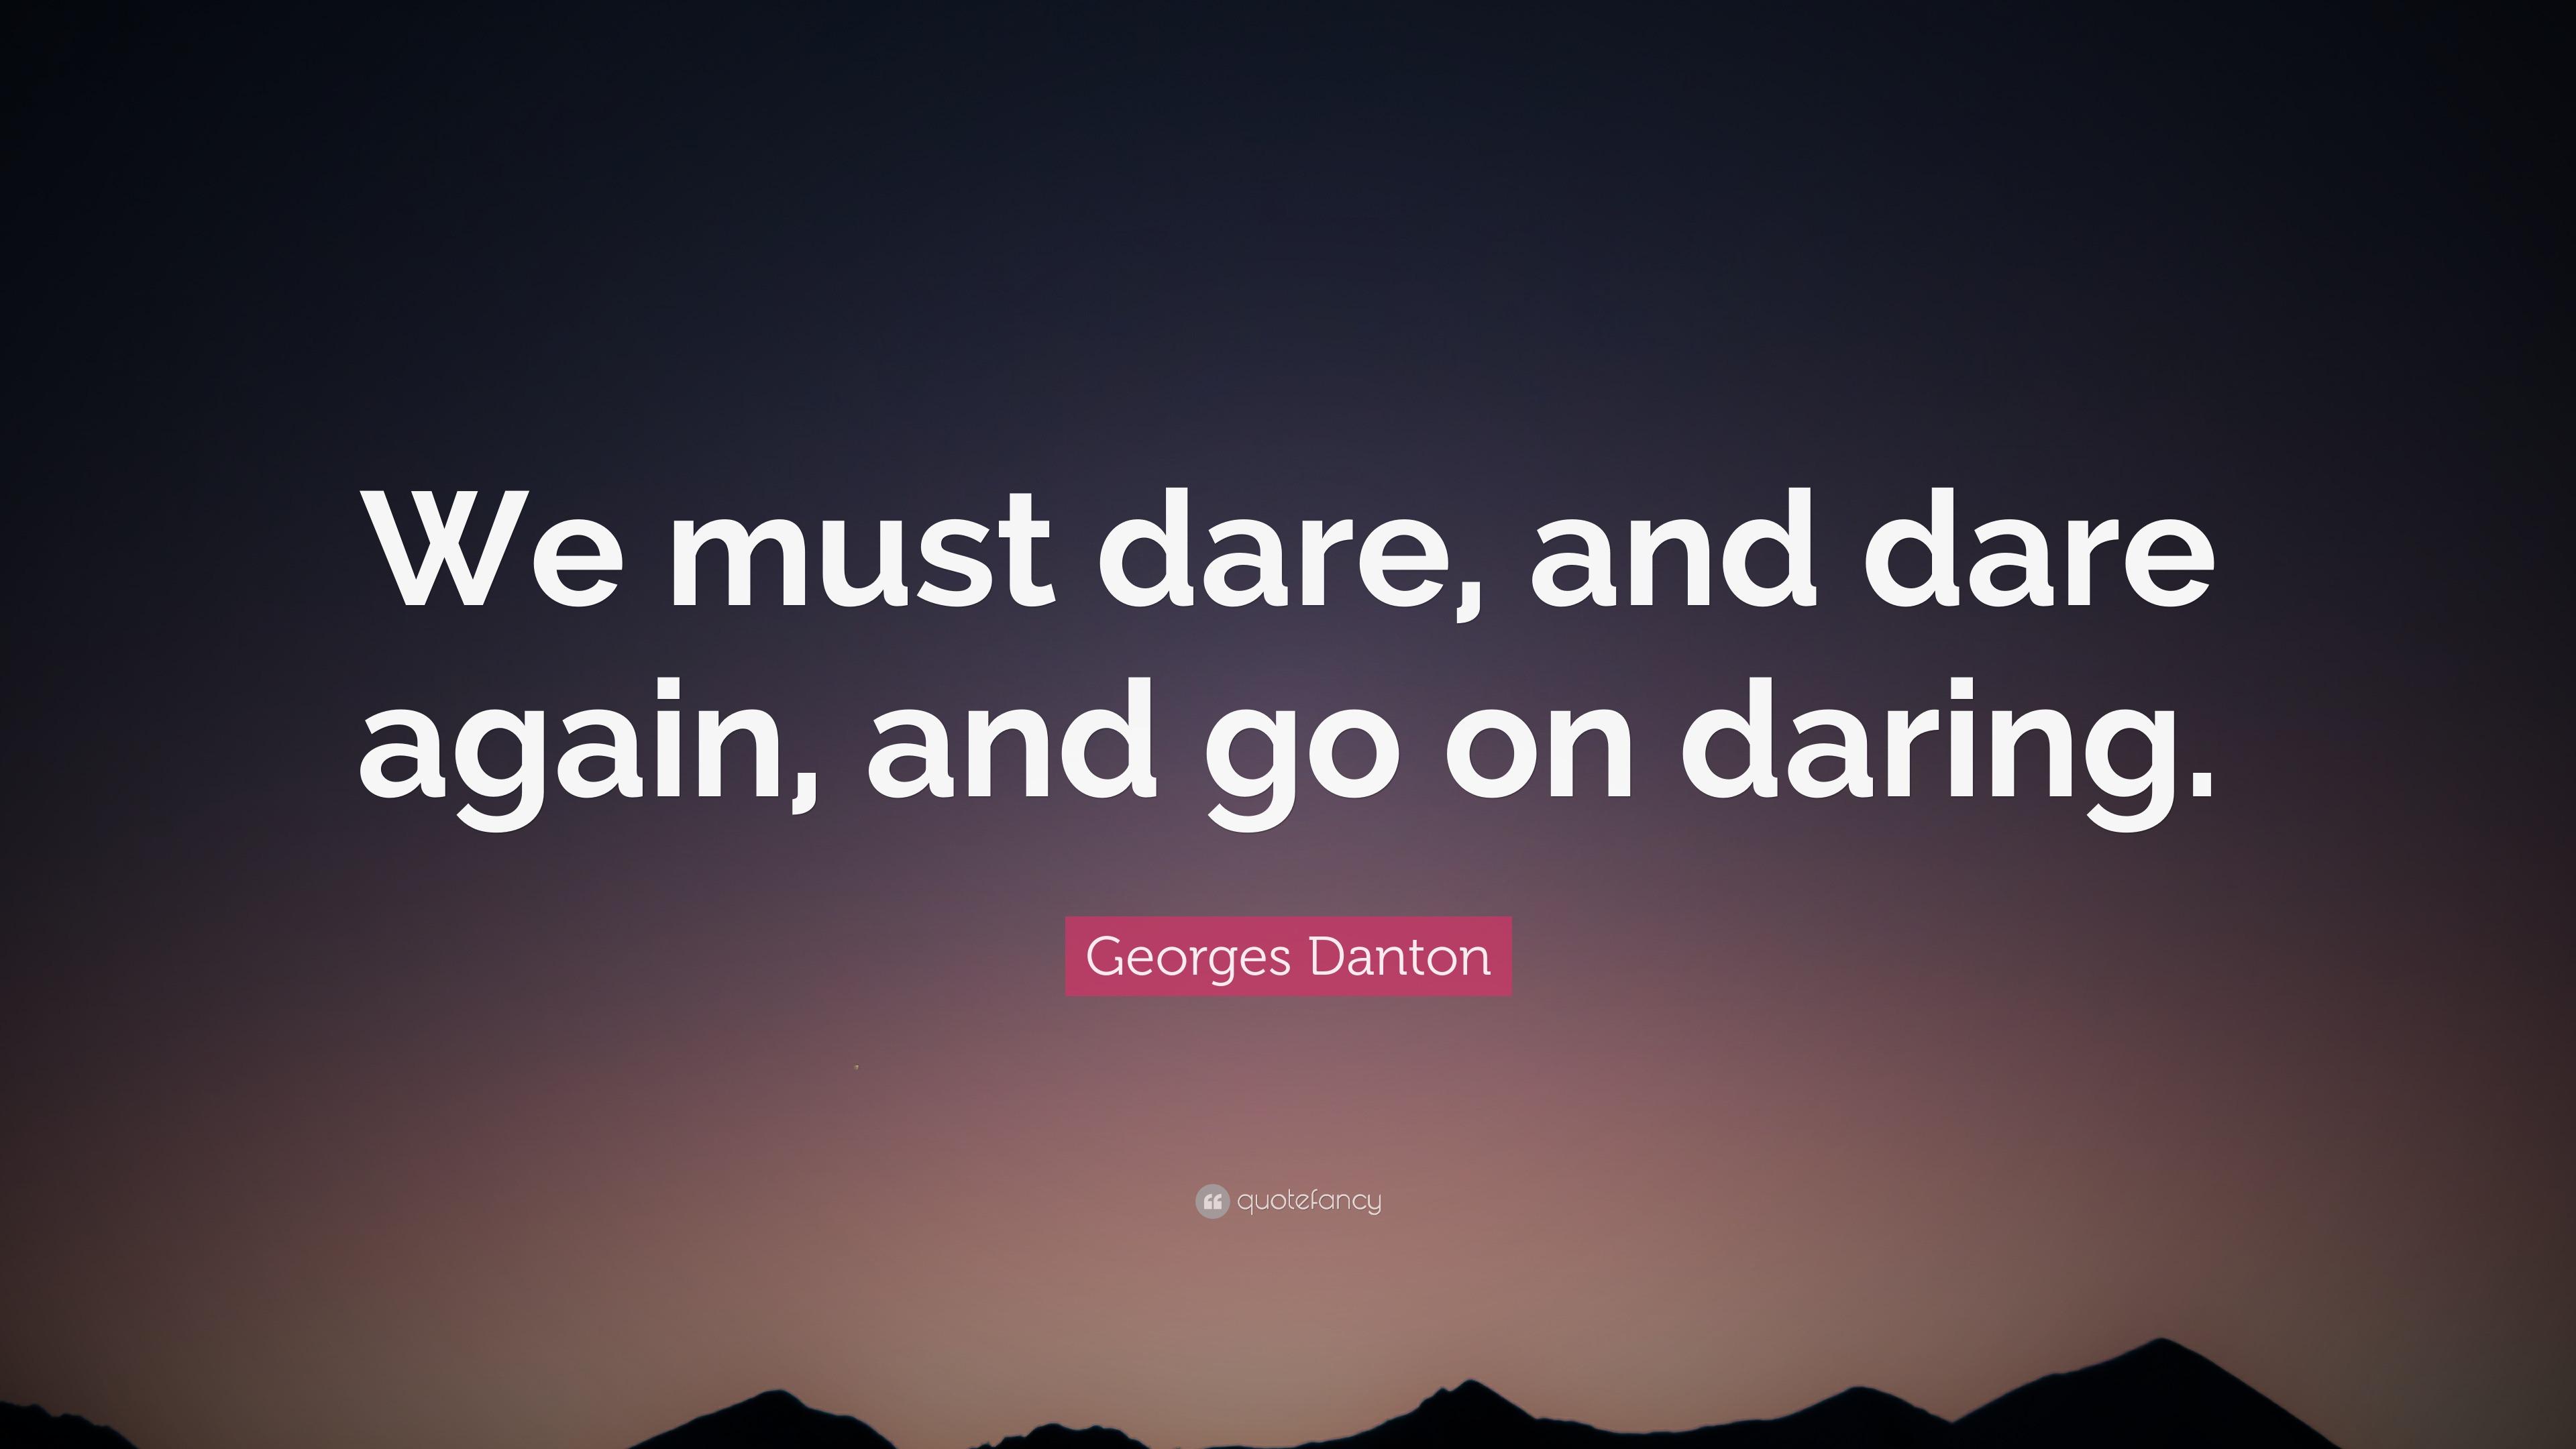 Georges Danton georges danton quotes (16 wallpapers) - quotefancy